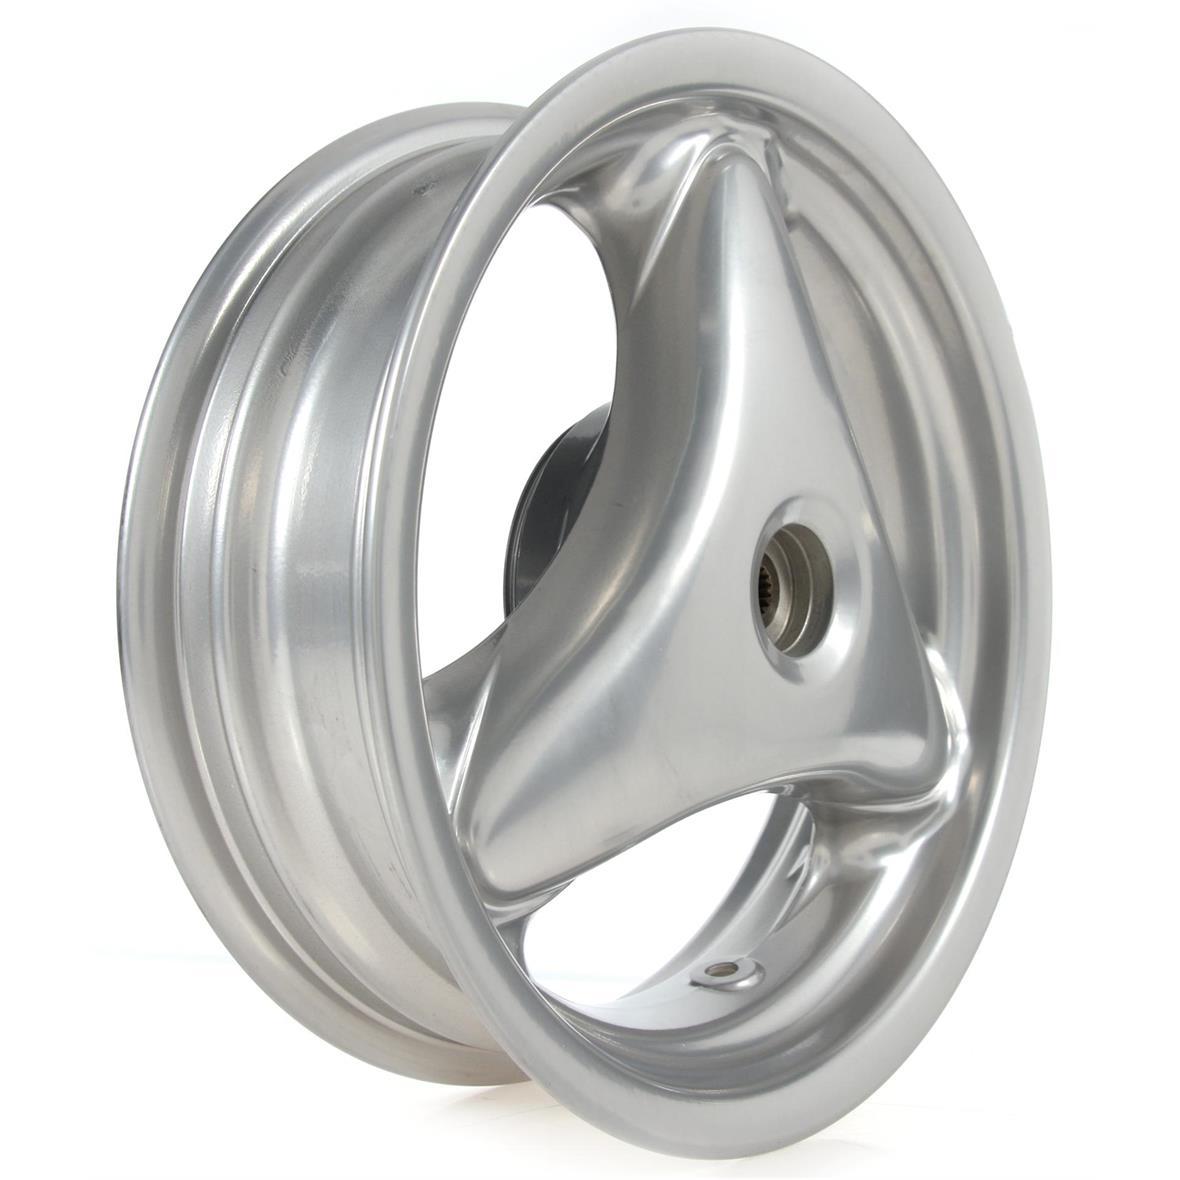 Product Image for 'Rim rear GRIMECATitle'